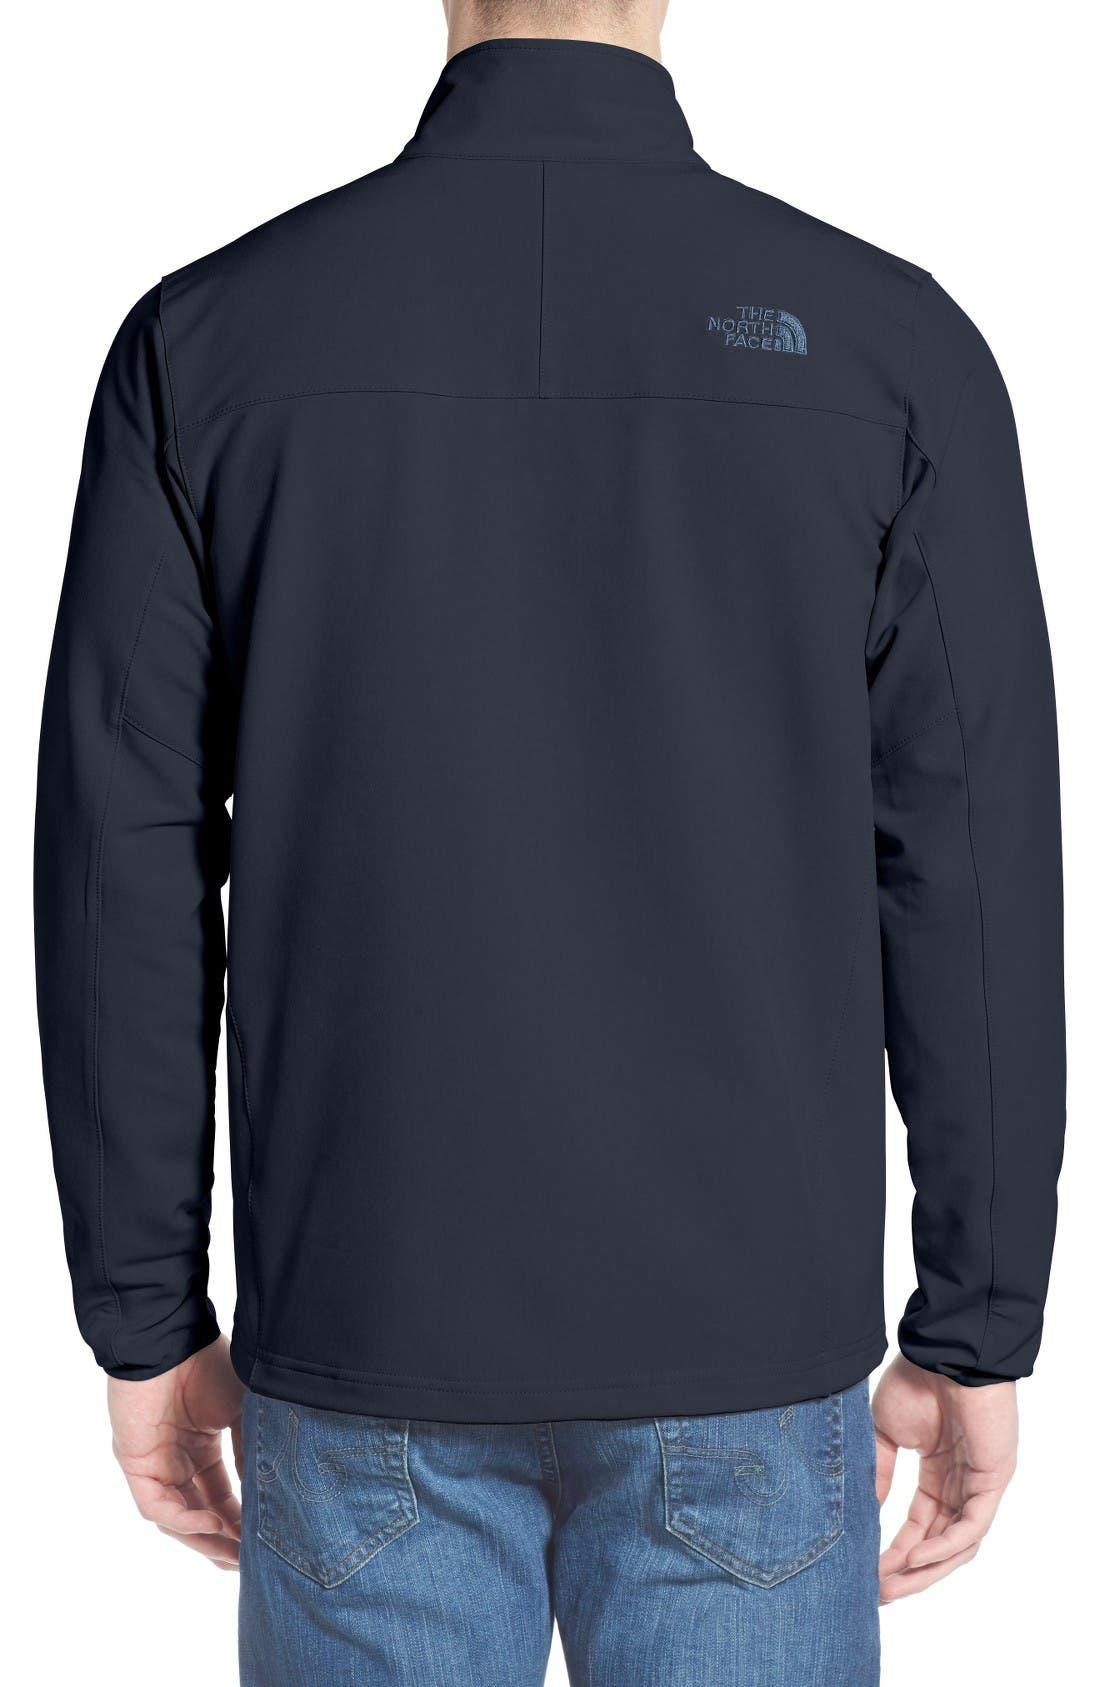 Apex Pneumatic Jacket,                             Alternate thumbnail 2, color,                             Urban Navy/ Urban Navy